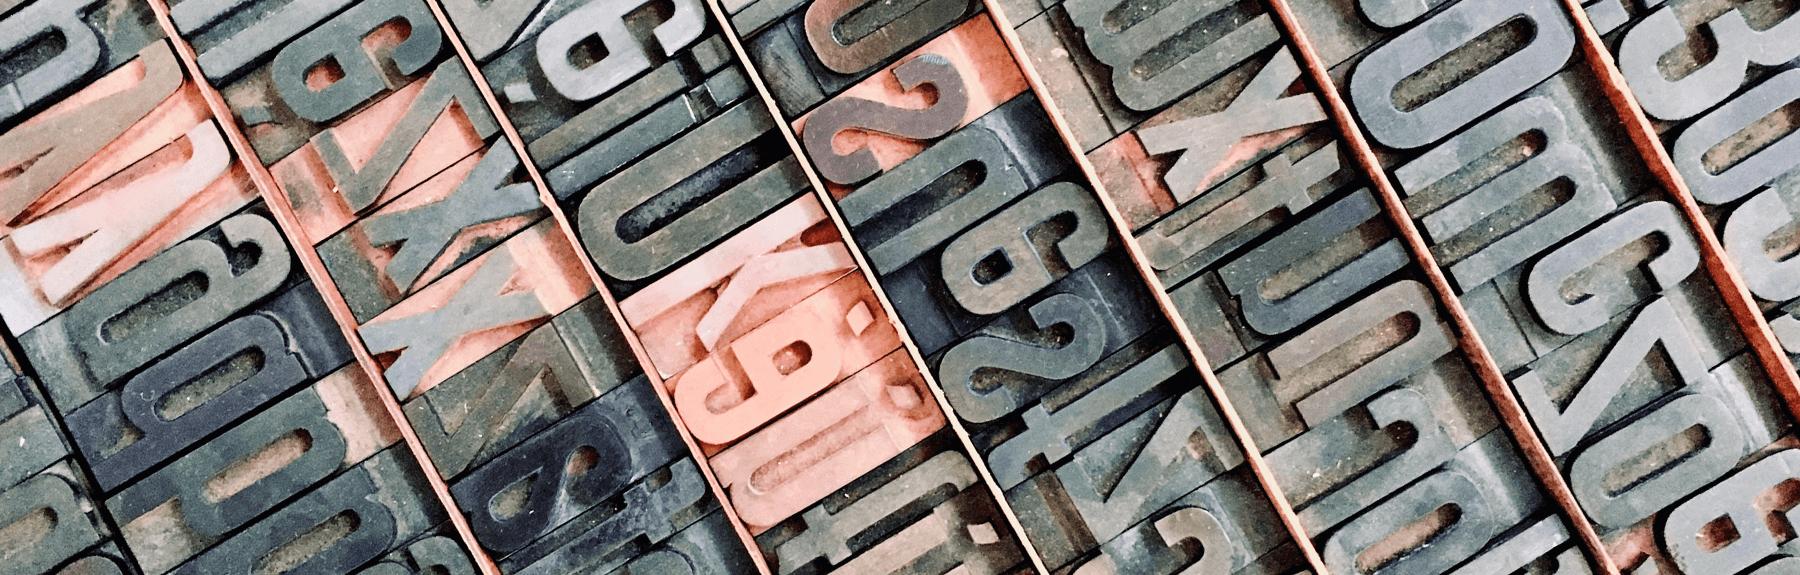 printing-blocks-header